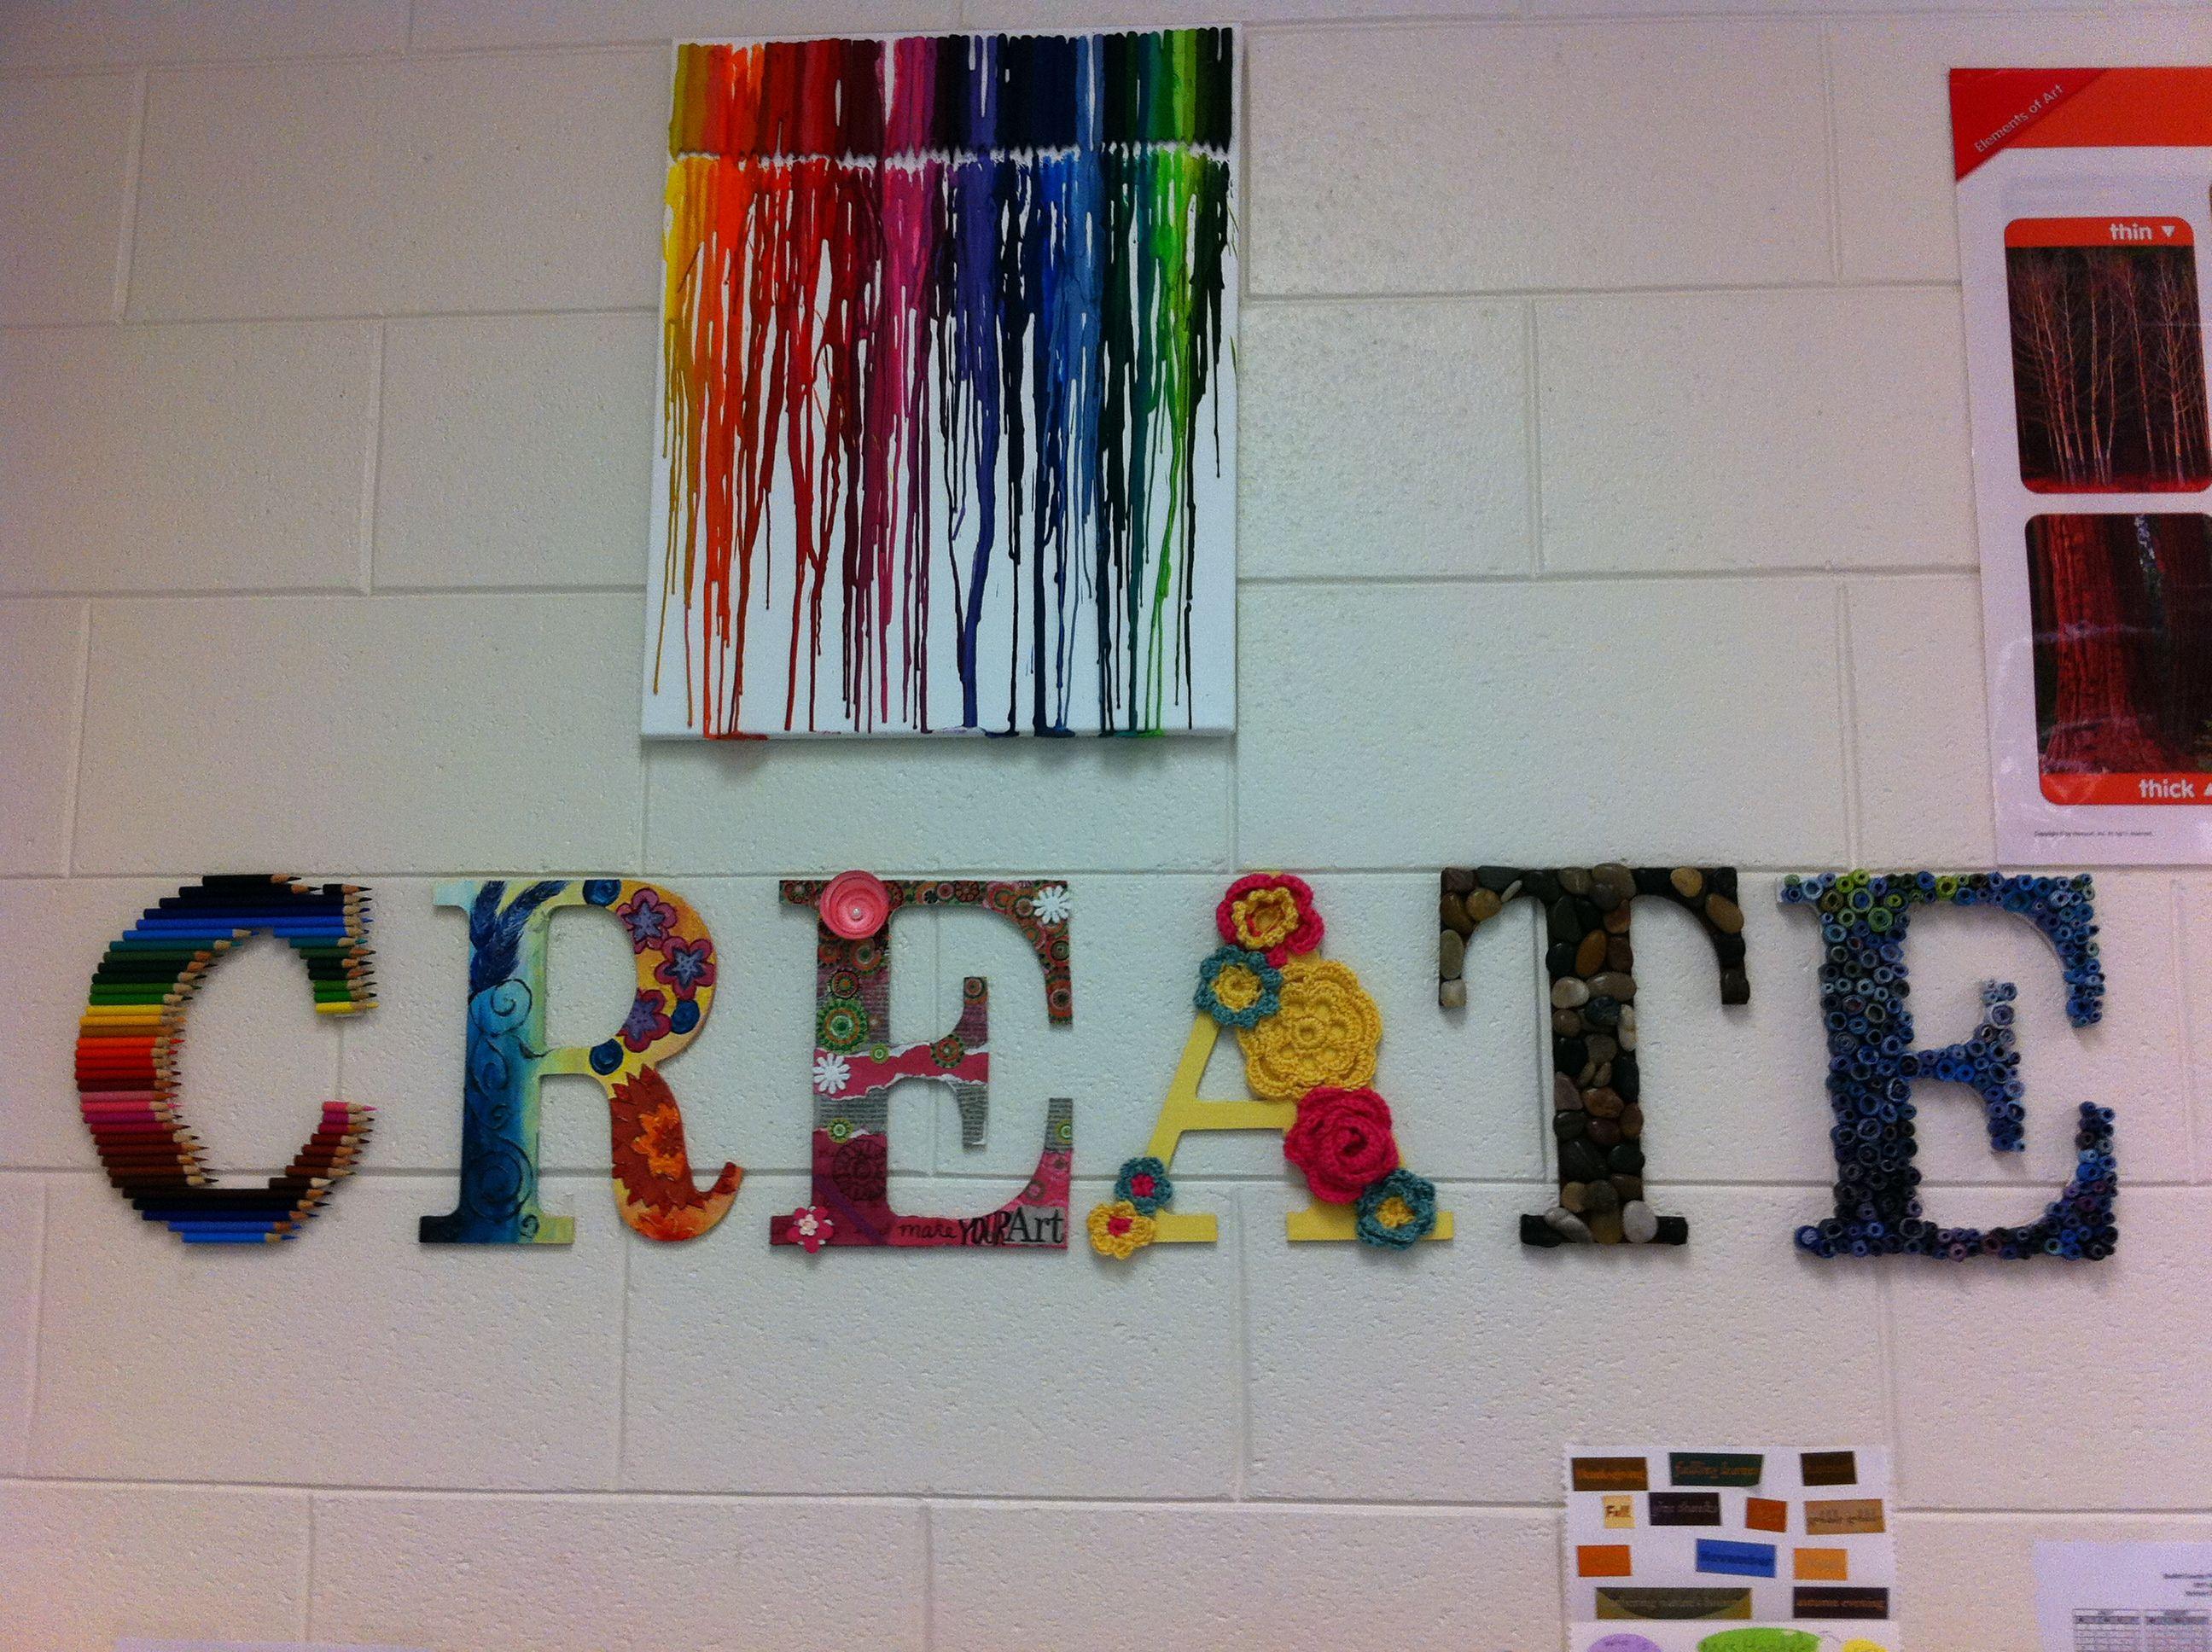 Pin By Ms Artsy Fartsy On Art Ed Art Classroom Decor Art Room Art Classroom